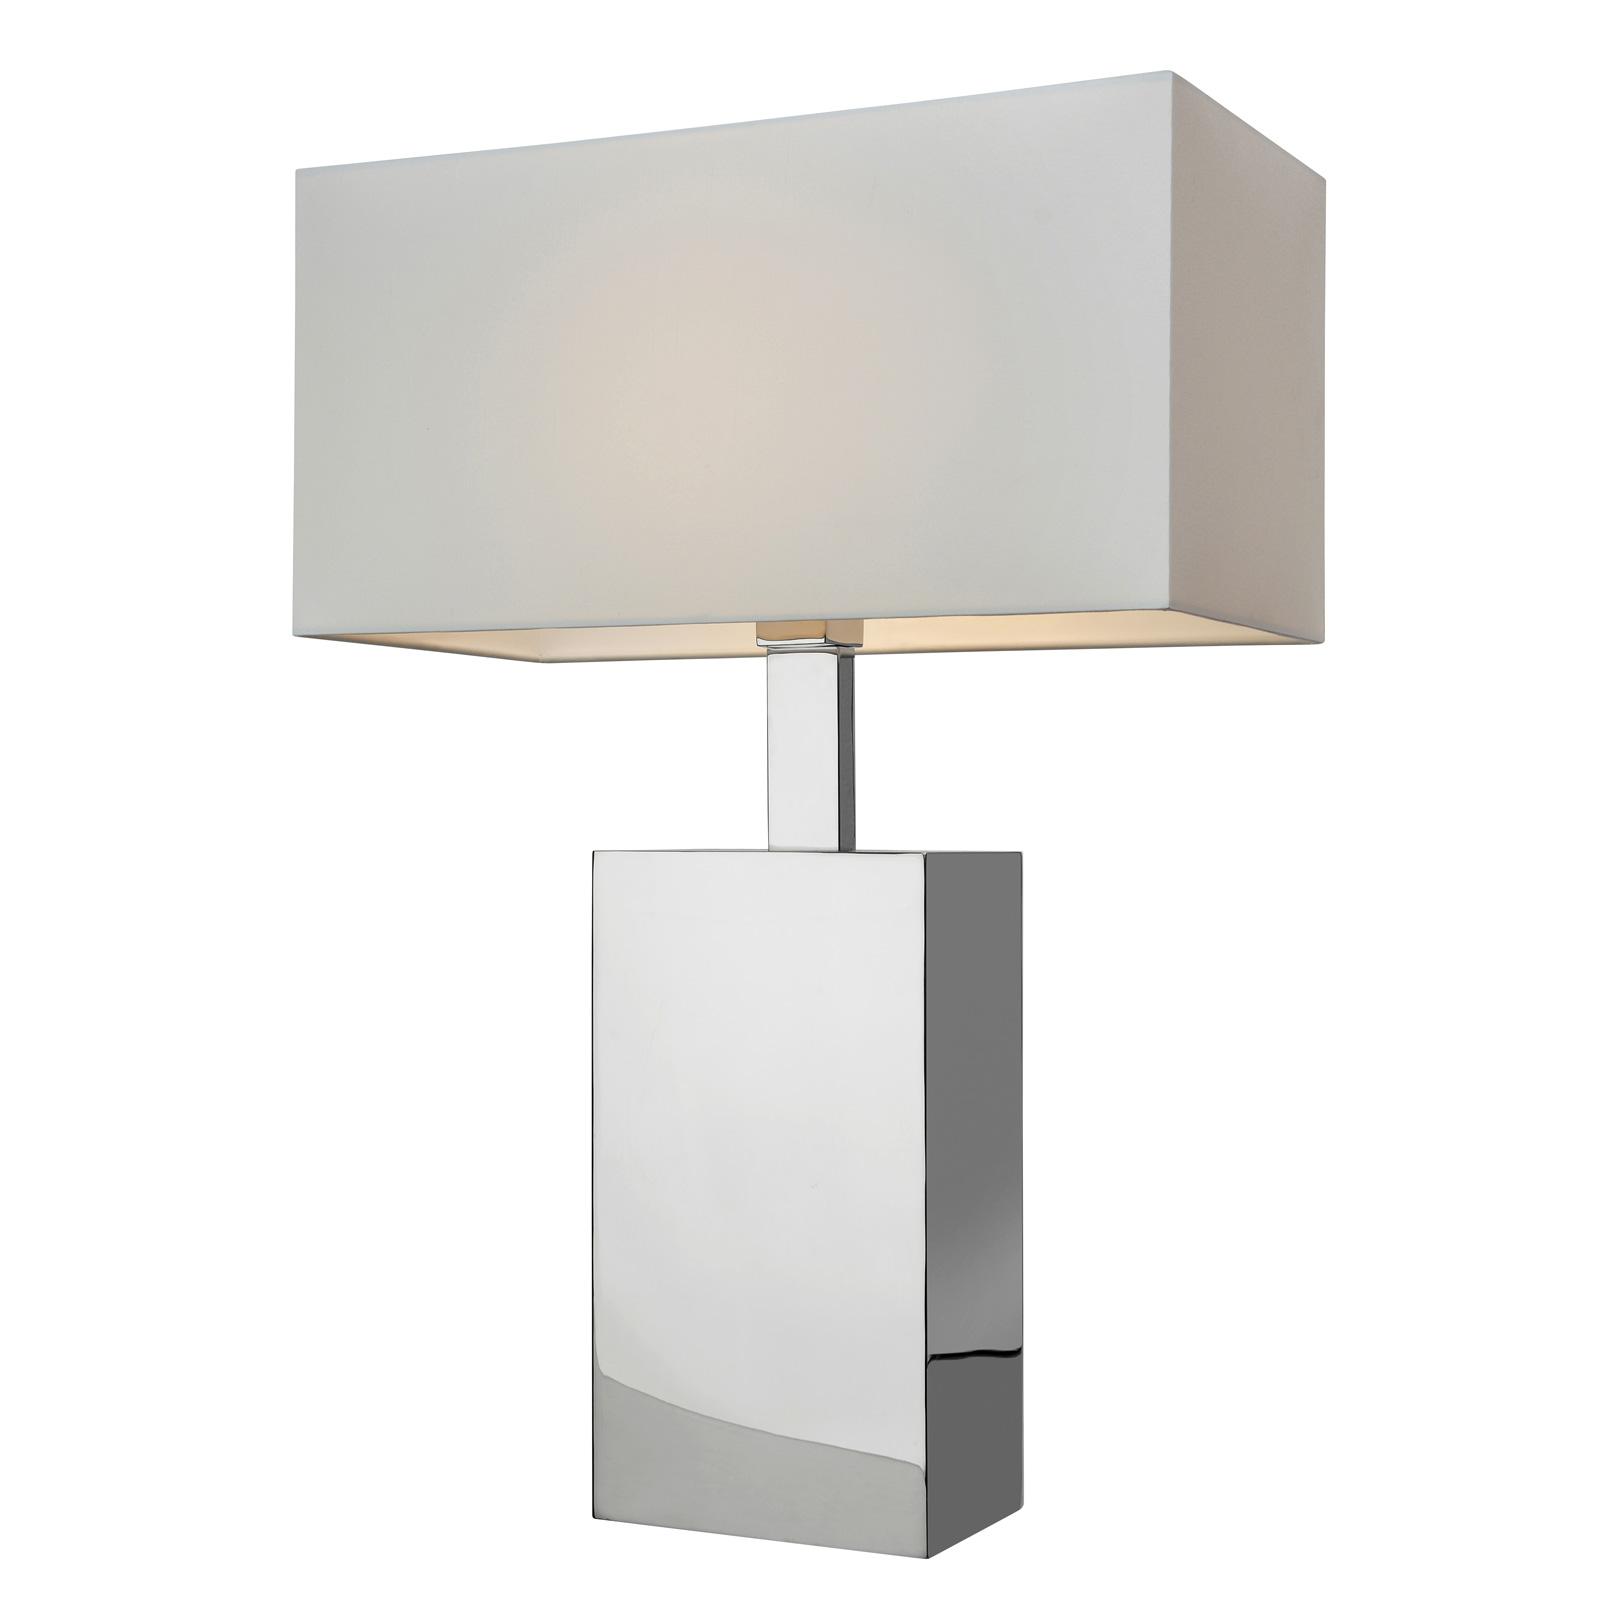 Tafellamp Block, hoogte 66 cm